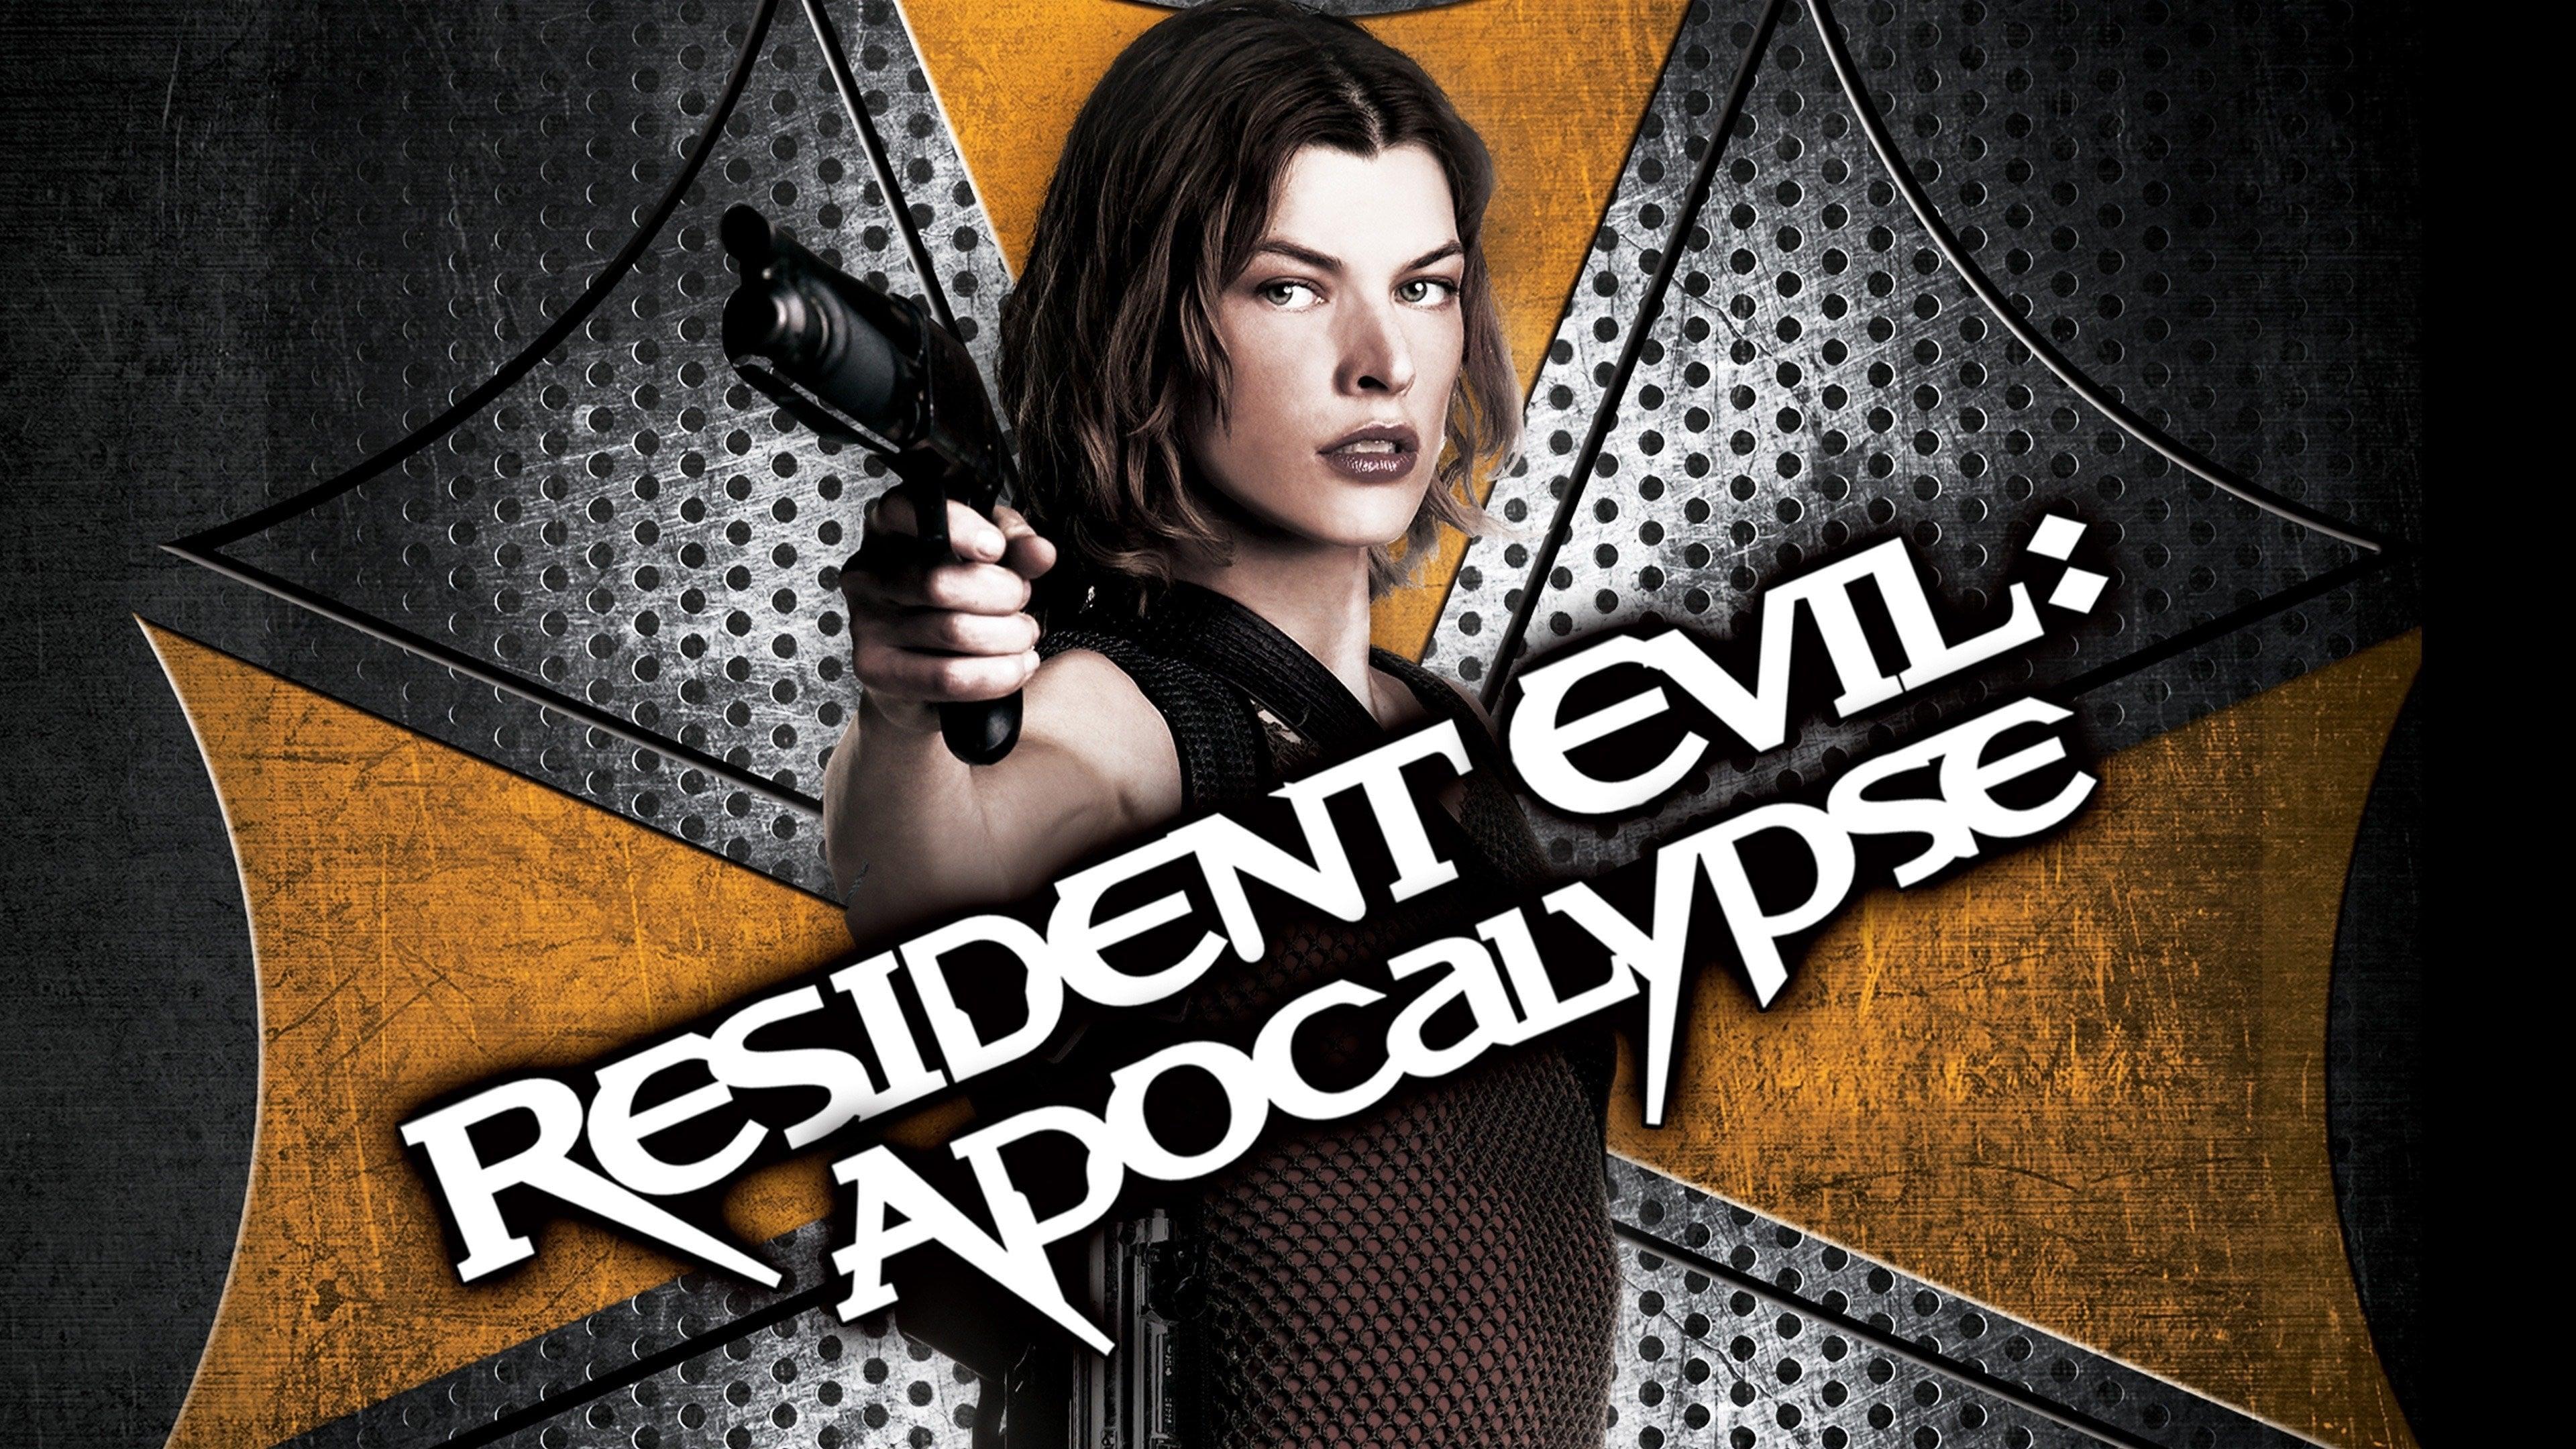 Resident Evil: Apocalipsis